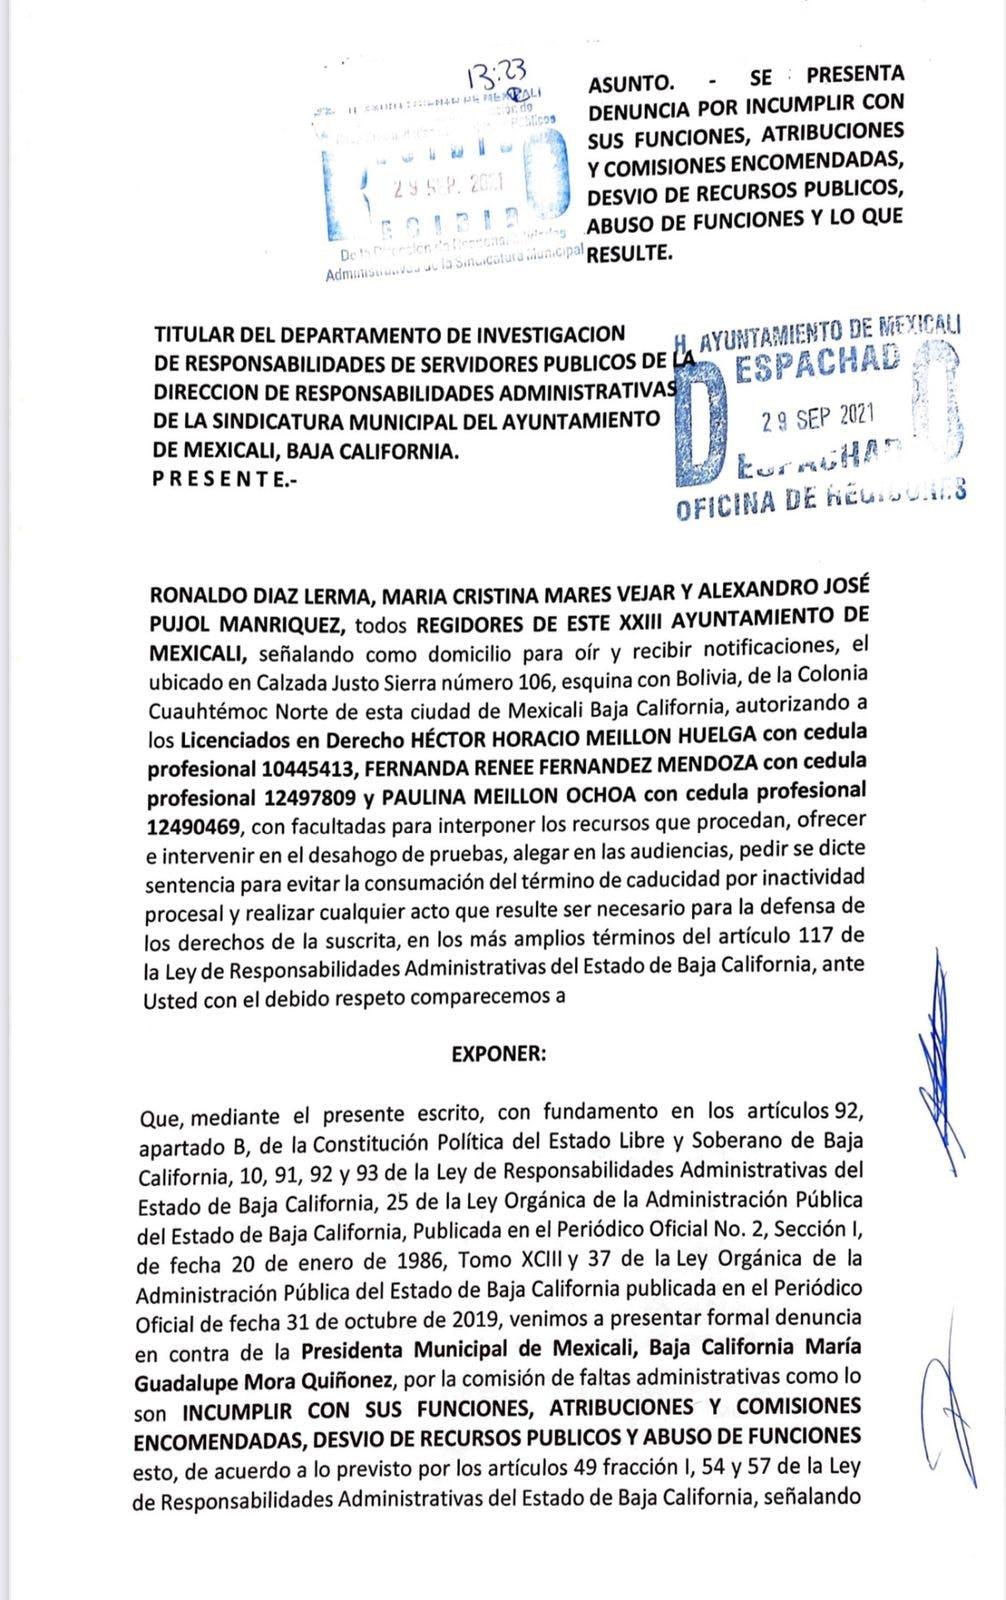 Denuncia contra Lupita Mora Quiñonez.